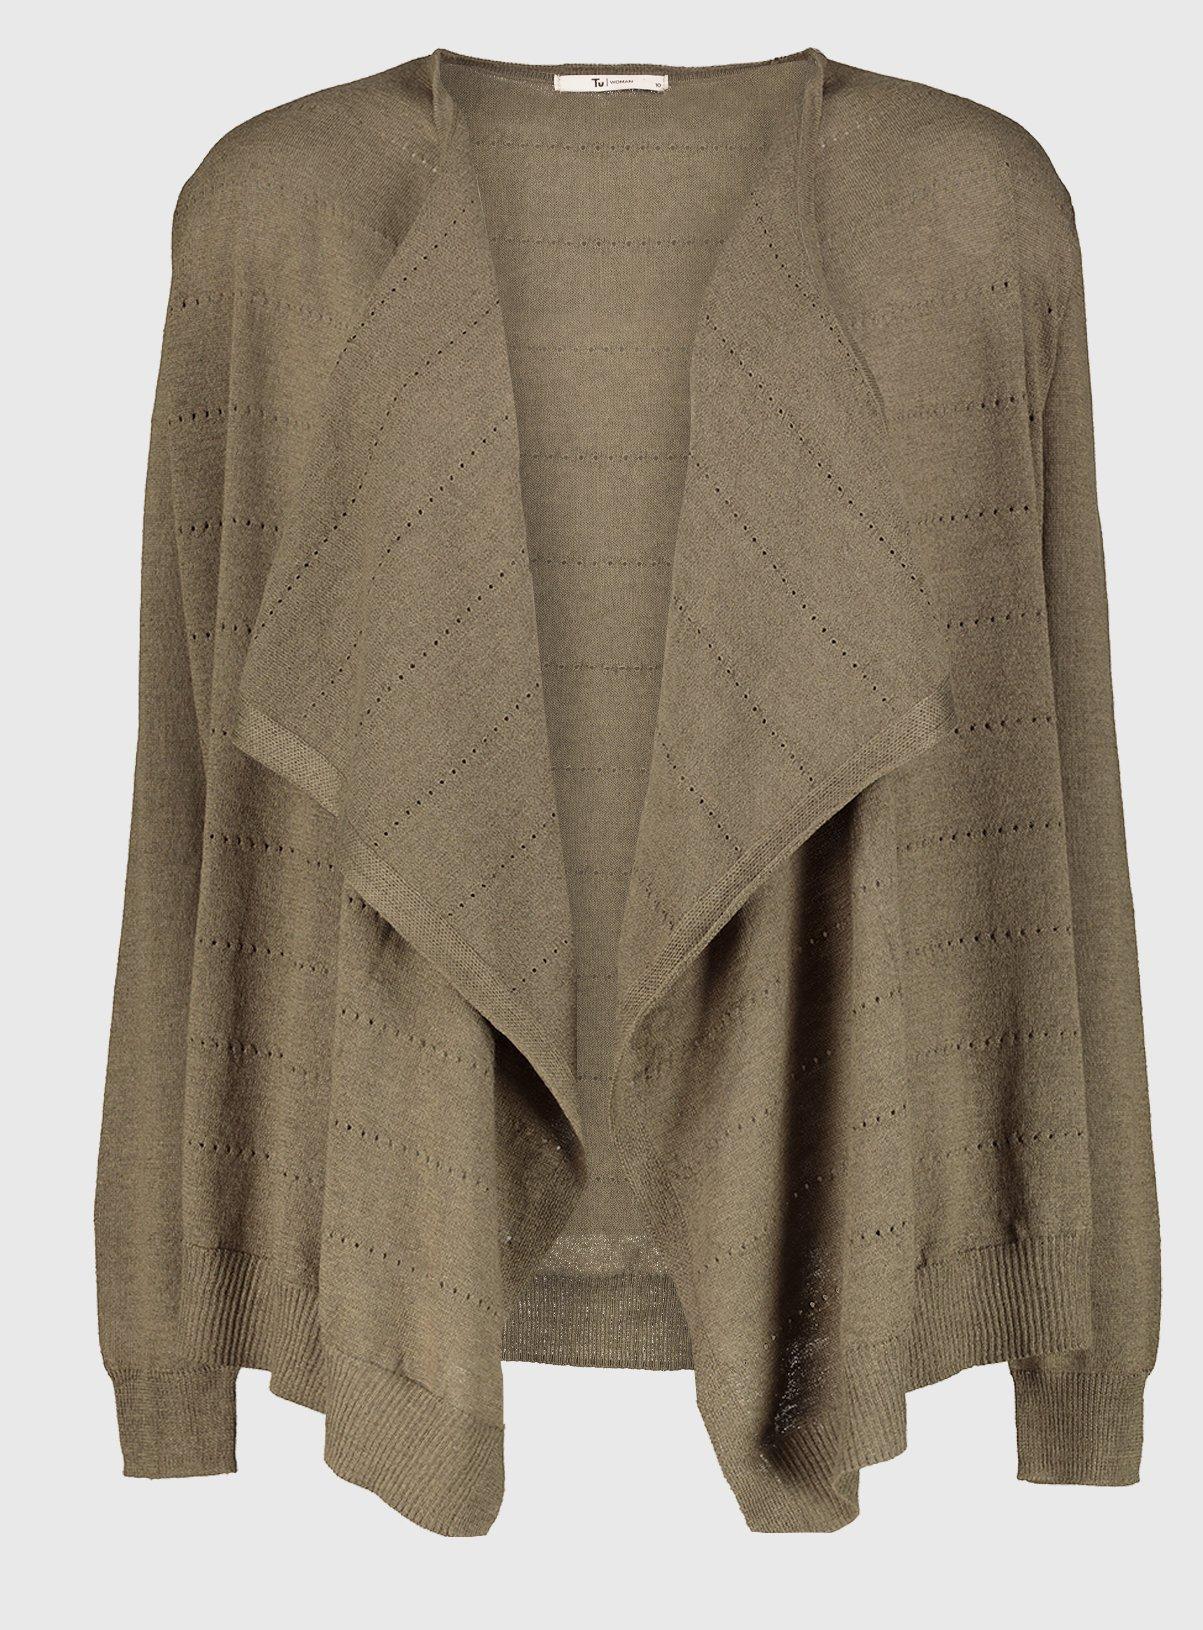 8,10,12,14,20 womens waterfall cardigan - £5.40 @ Argos